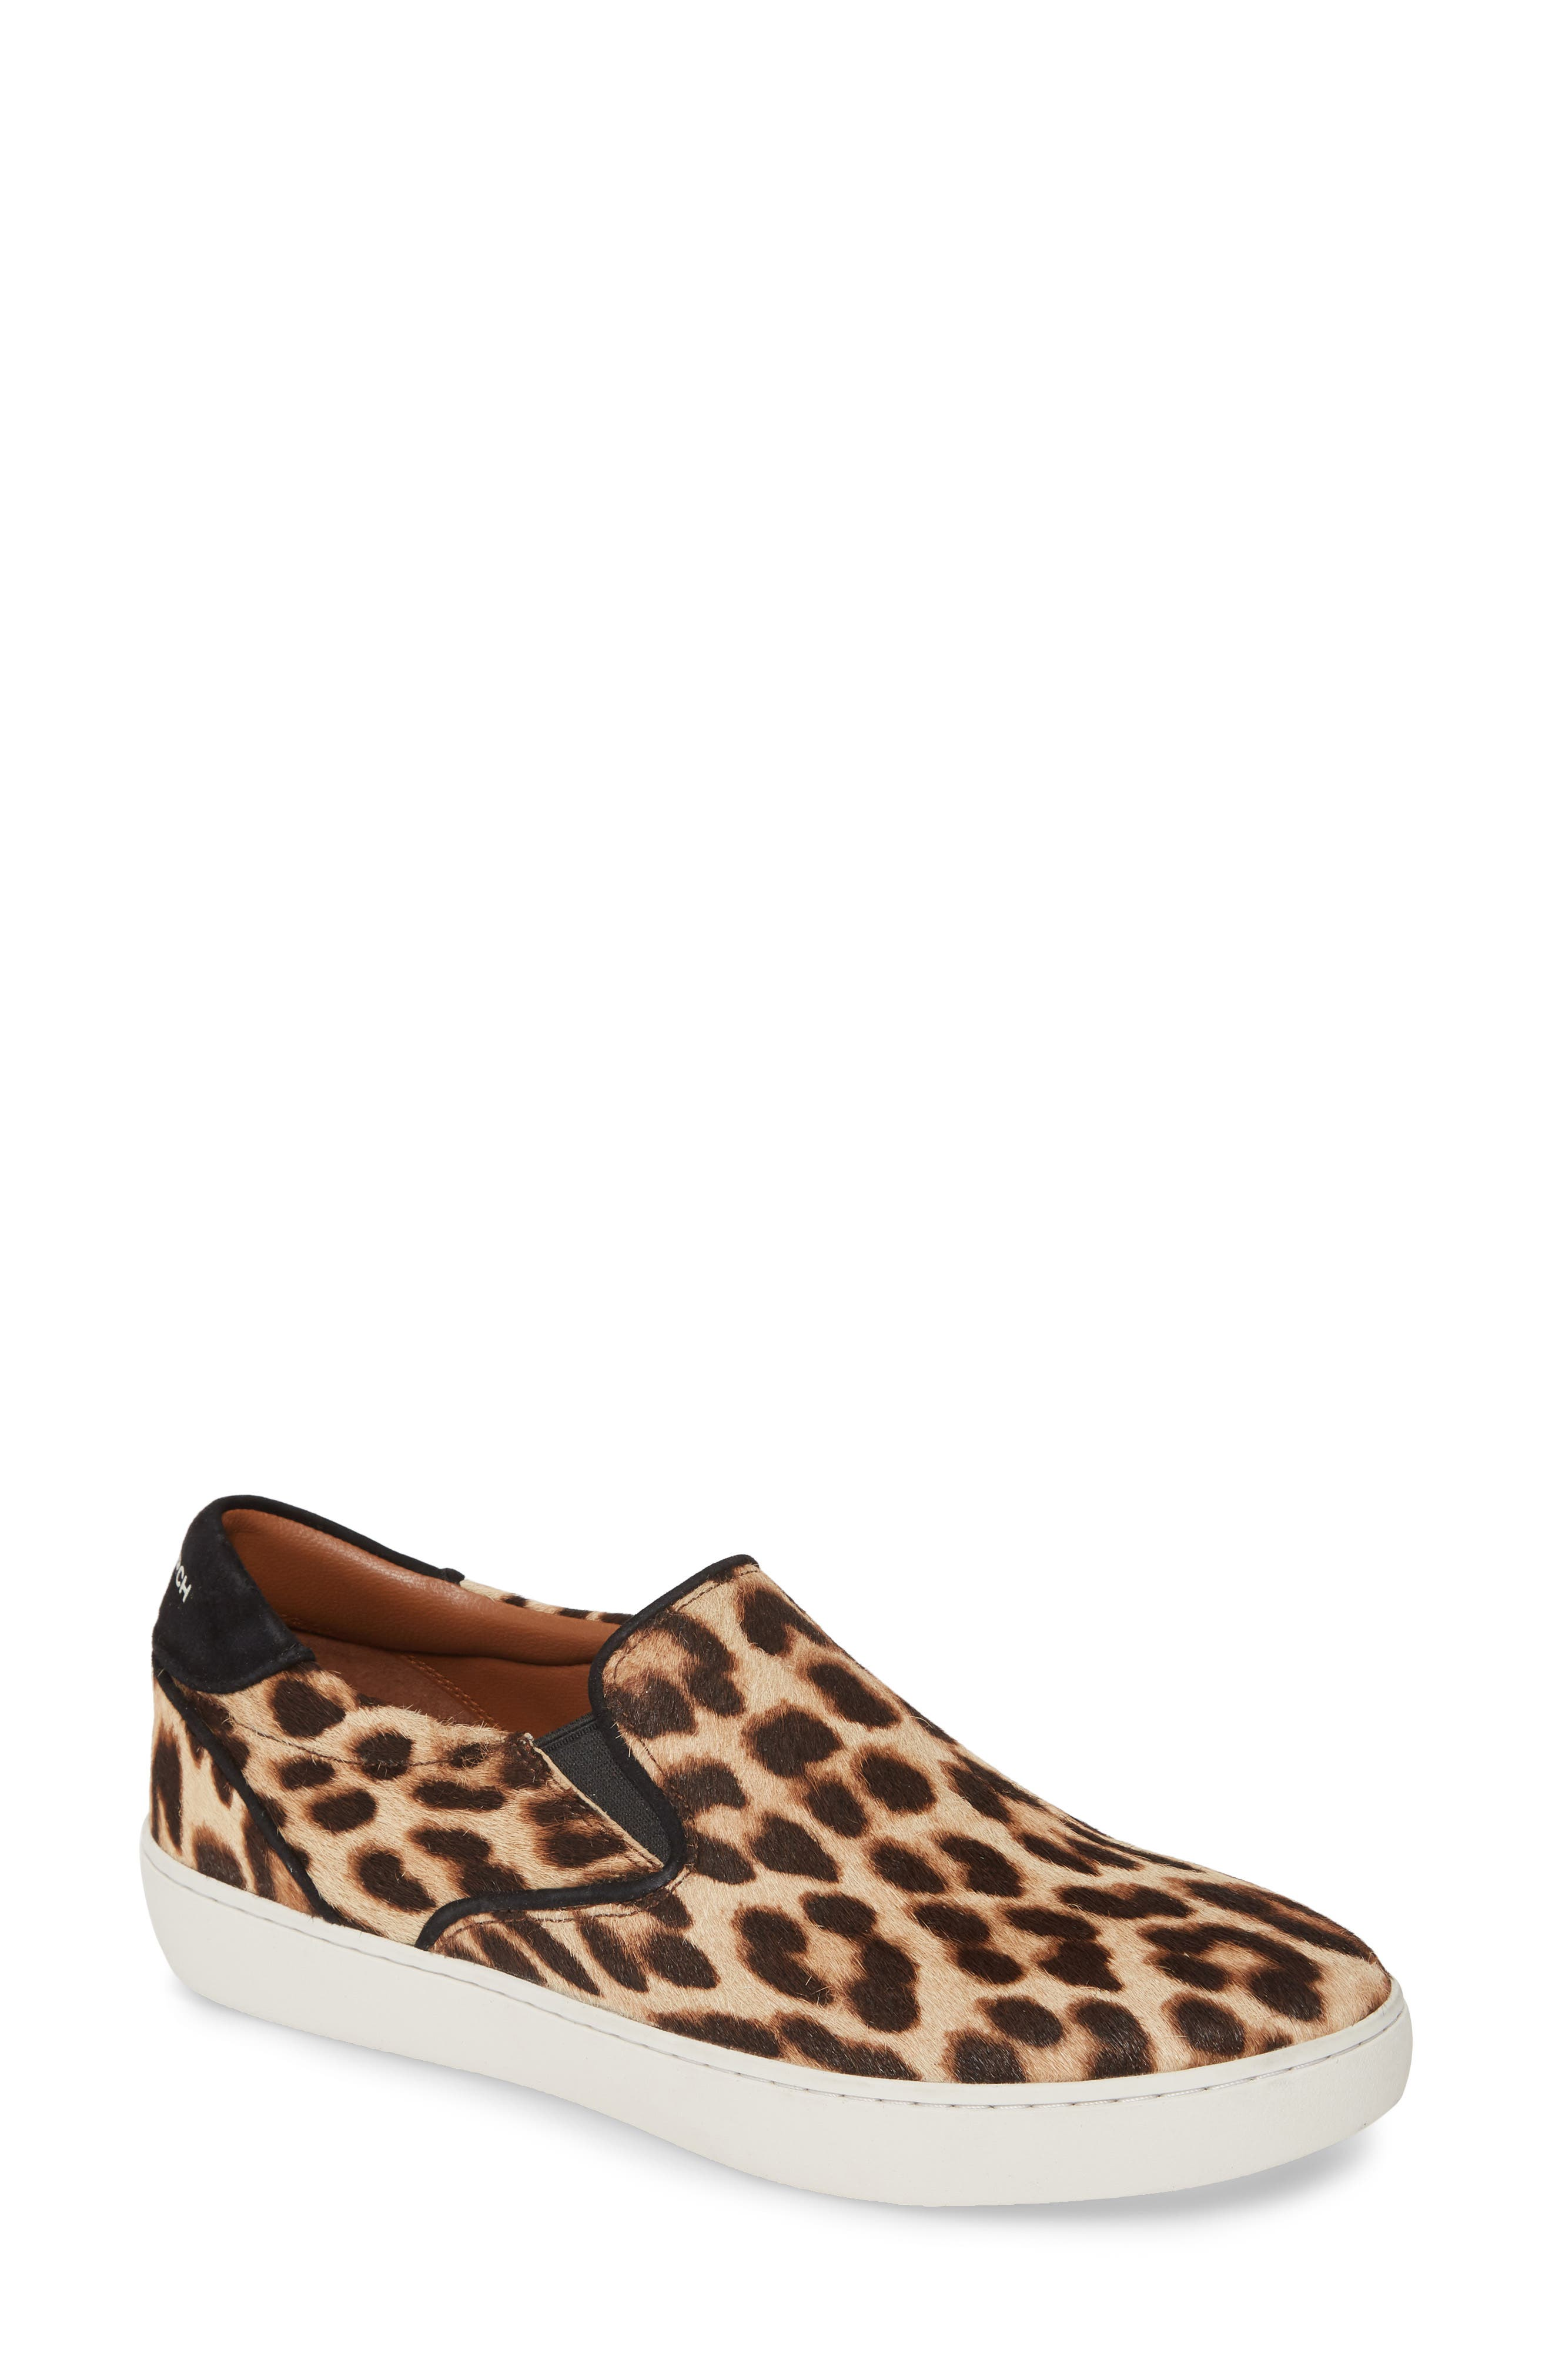 Tory Burch Flats Genuine Calf Hair Sneaker